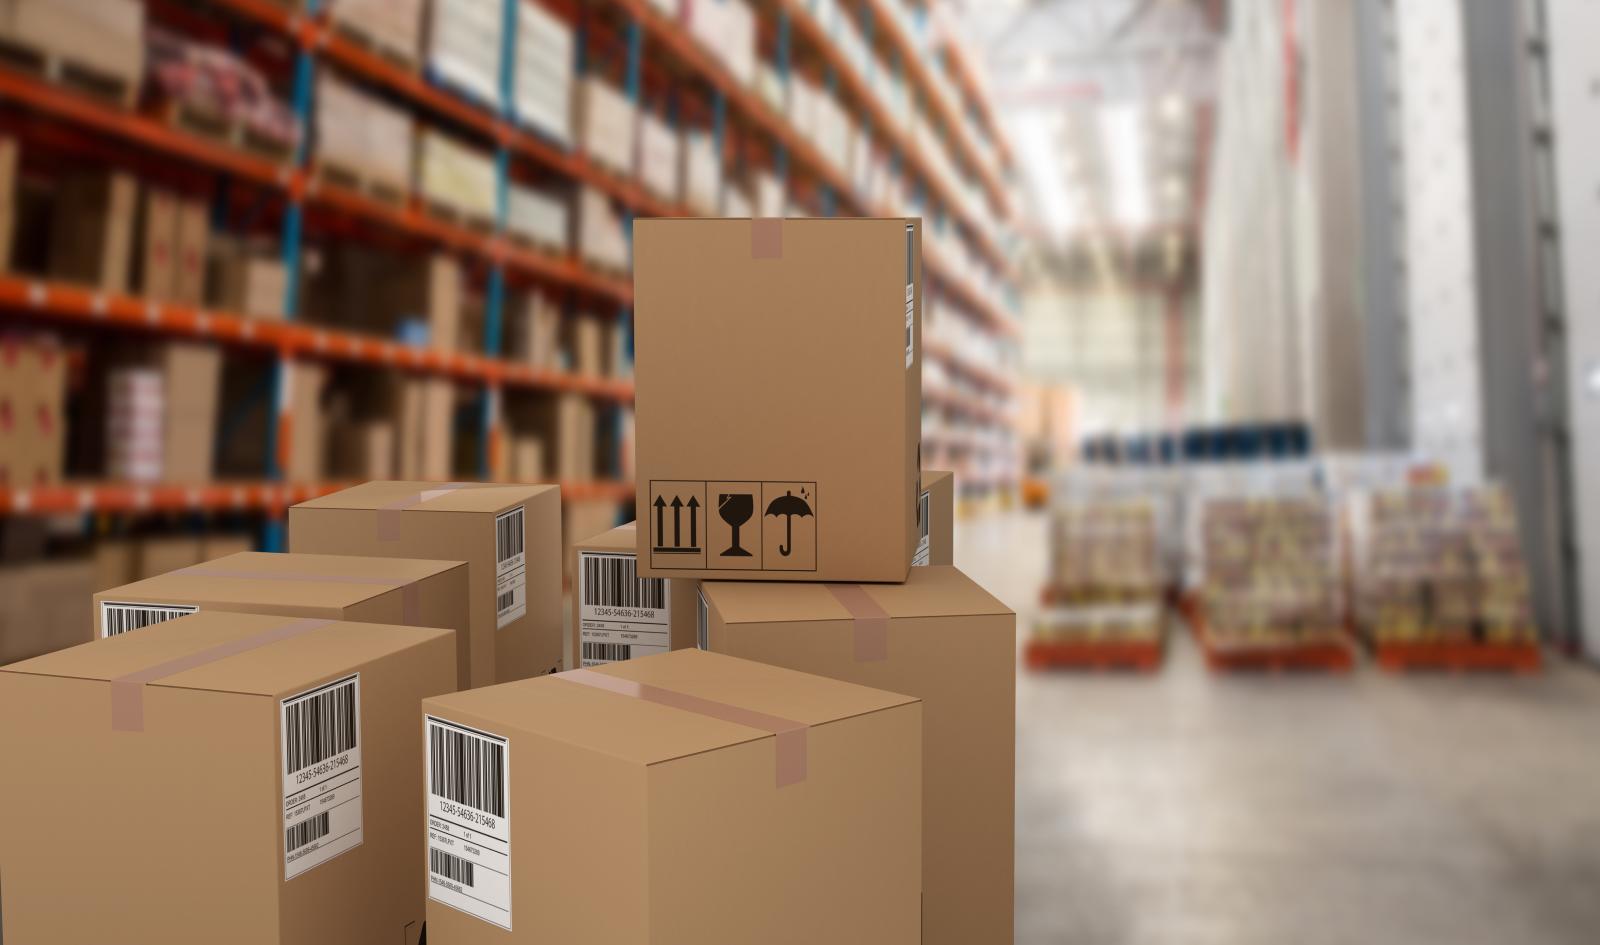 1600 X 945 warehosue boxes